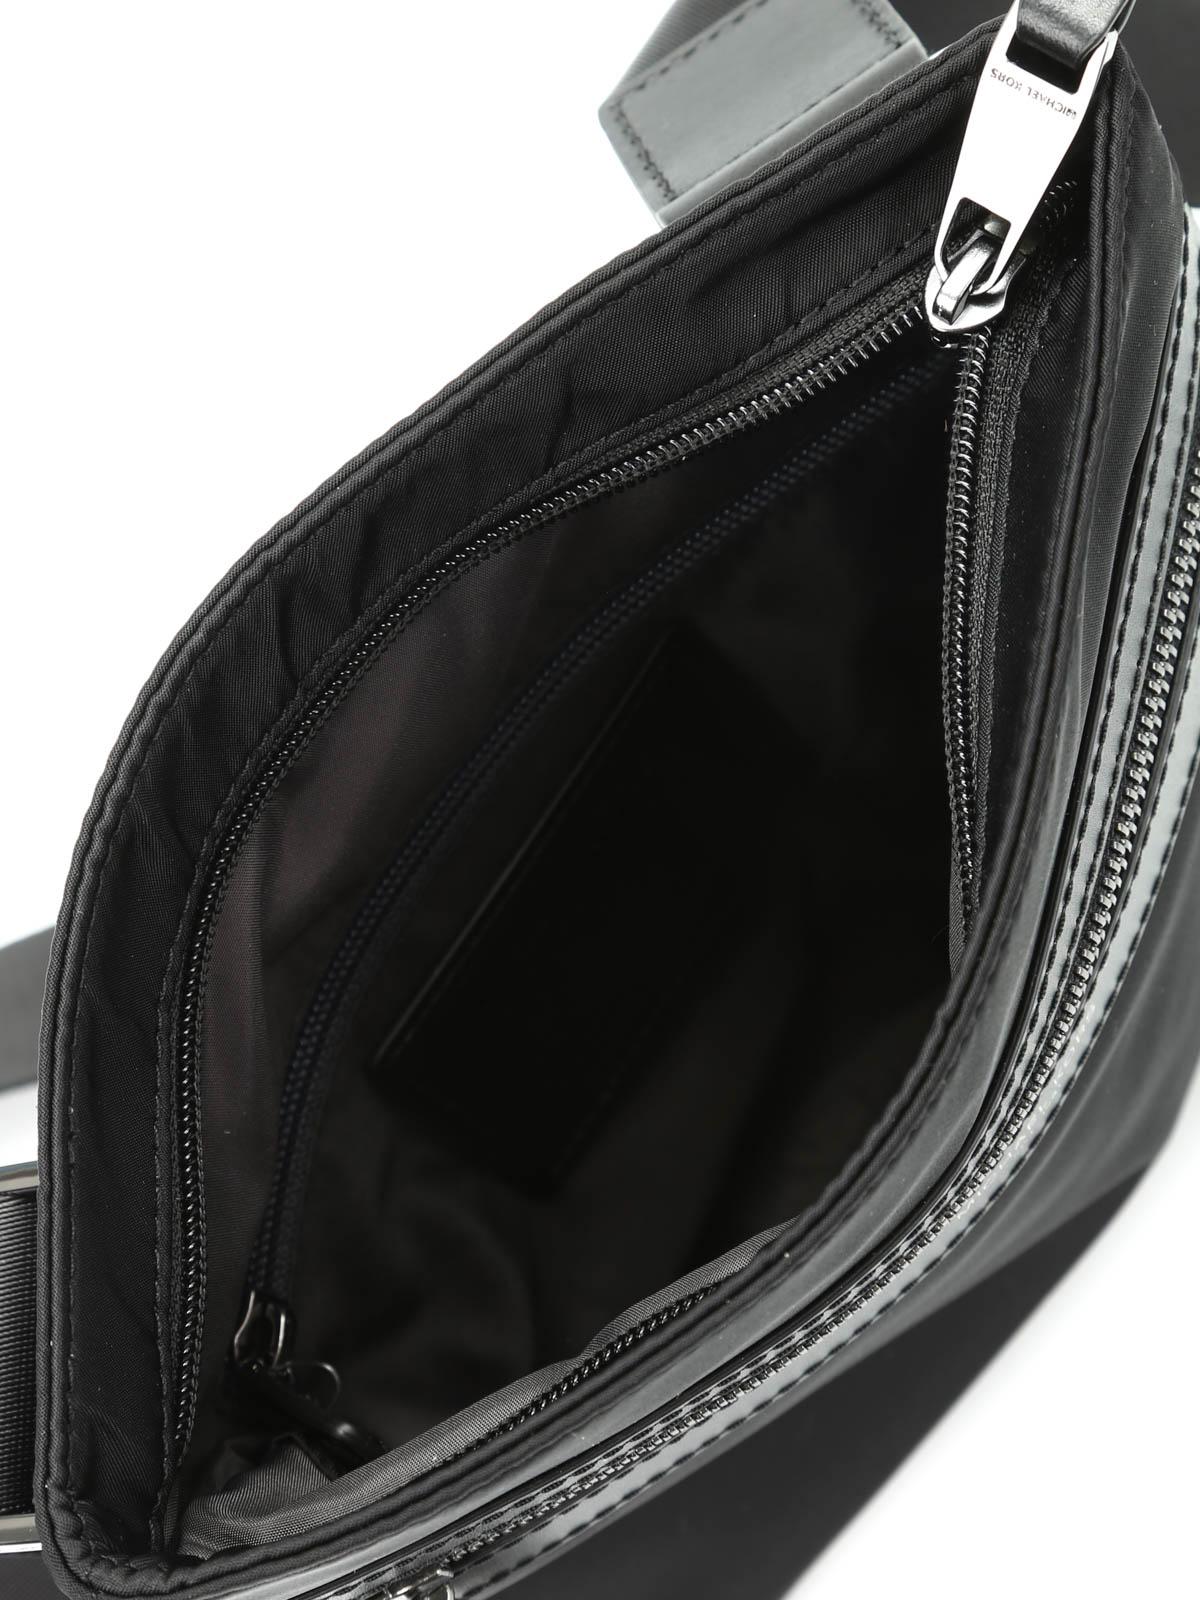 d79585550729 iKRIX MICHAEL KORS  Kent messenger bag · MICHAEL KORS  cross body bags ...